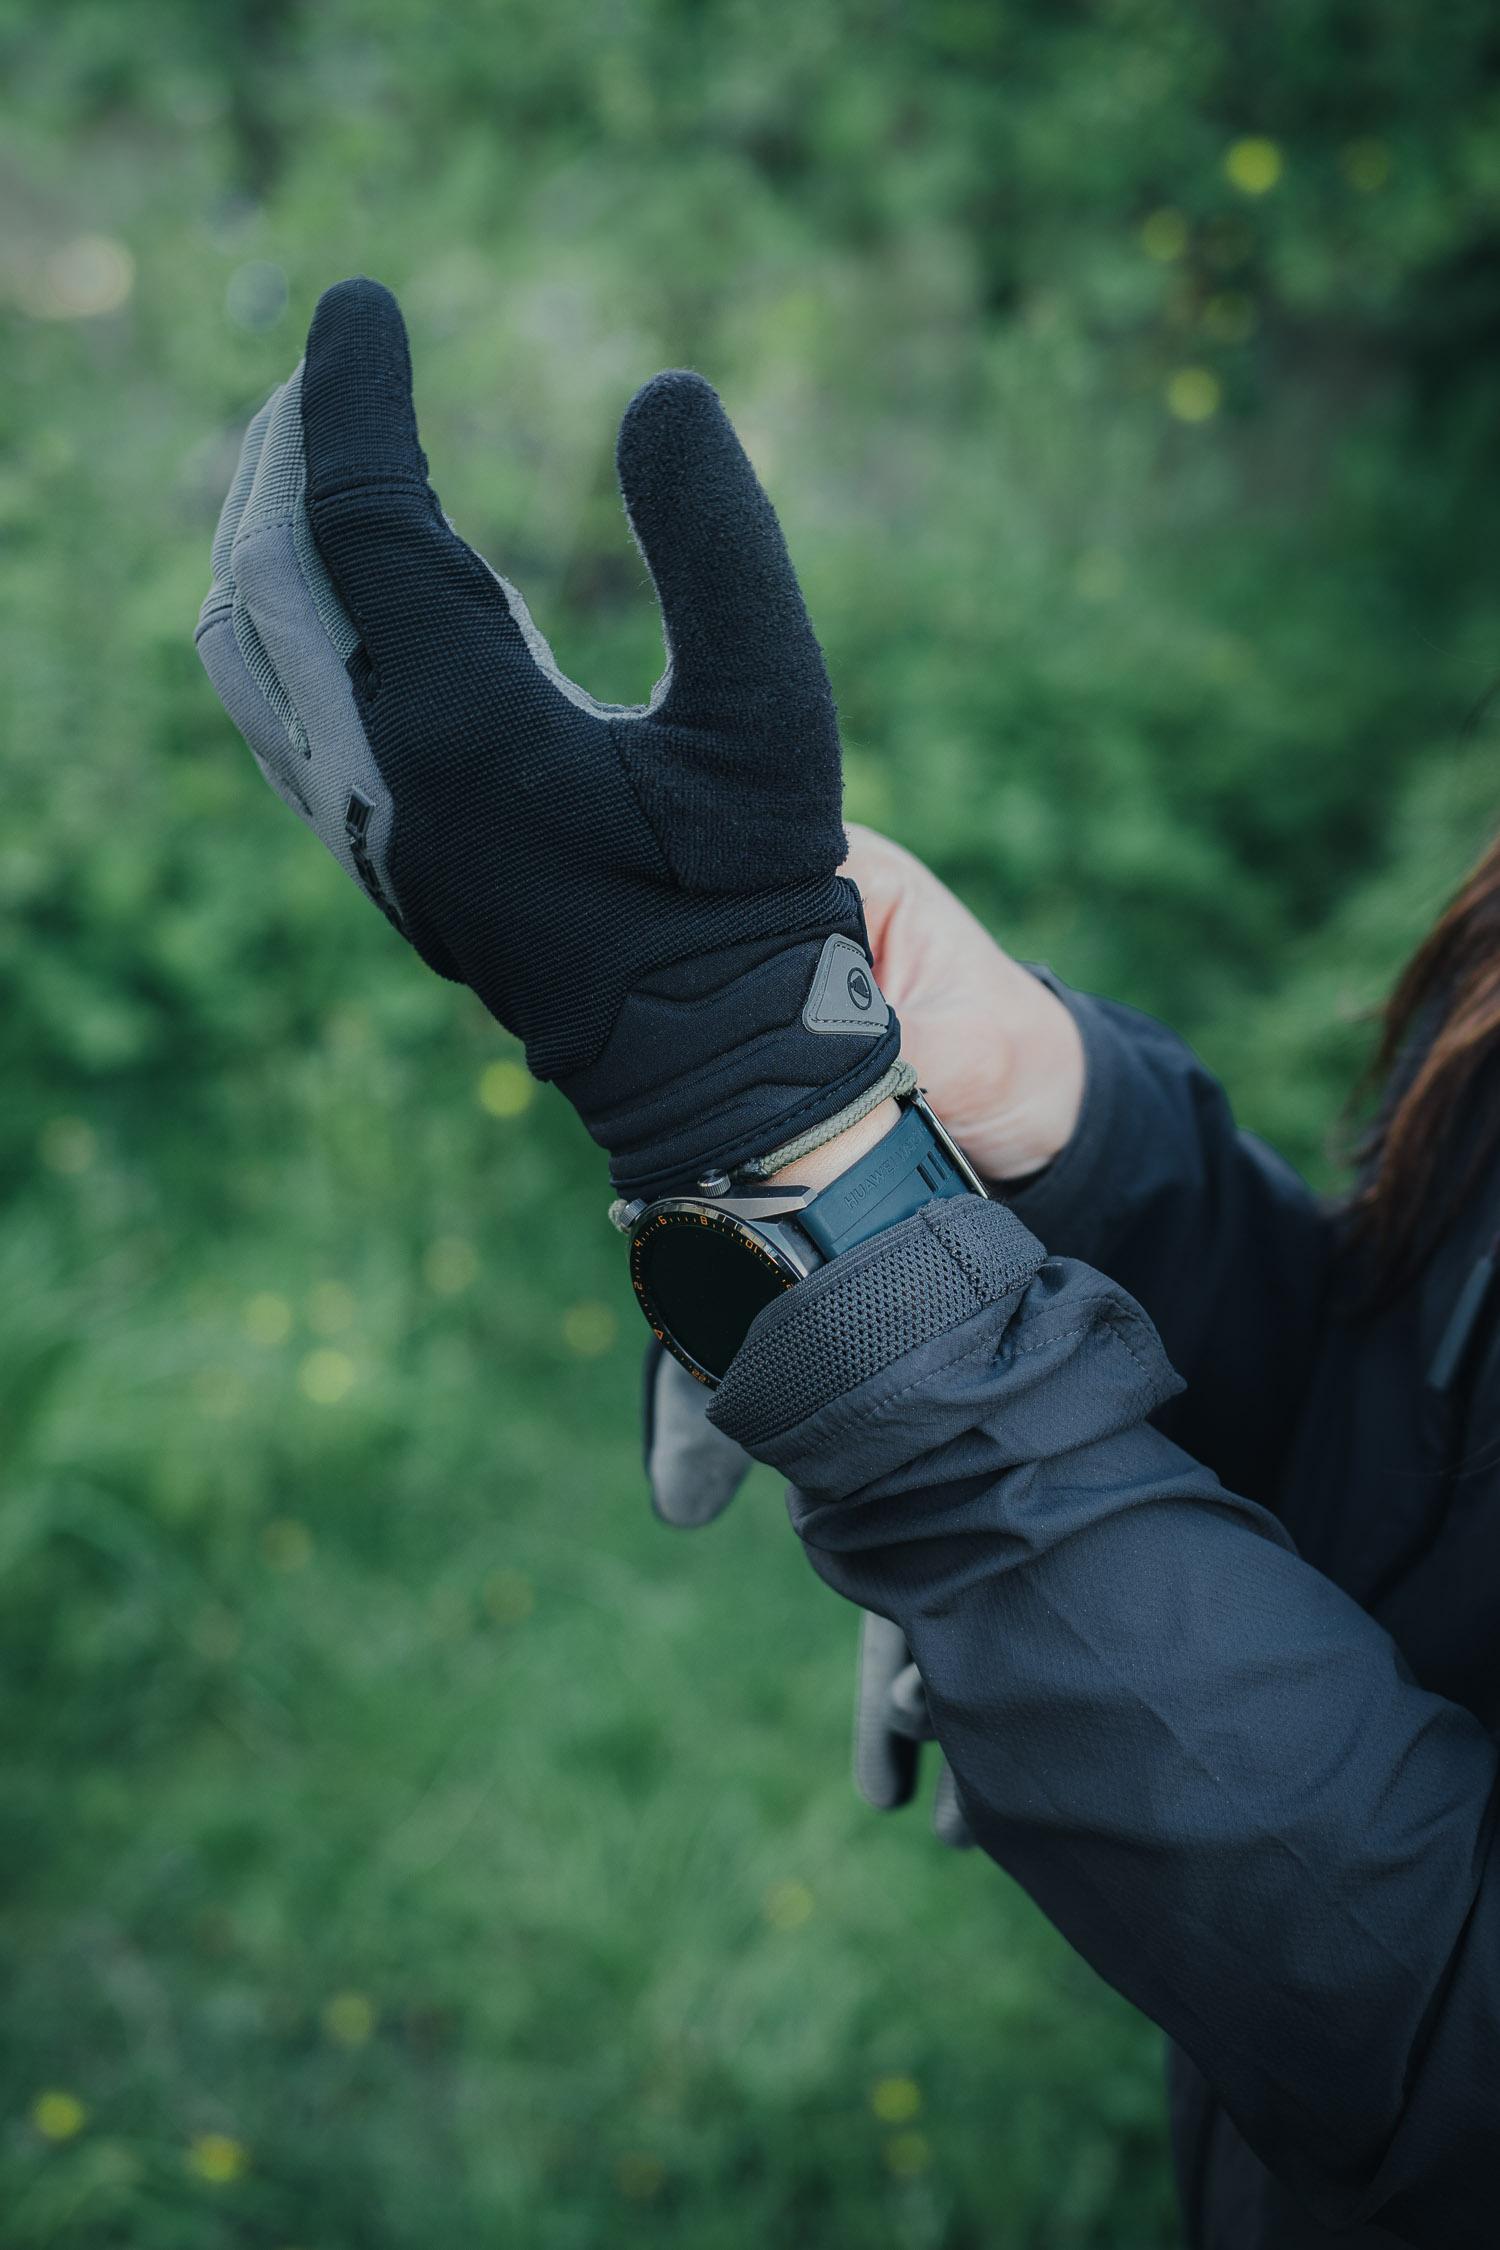 putting on bike gloves